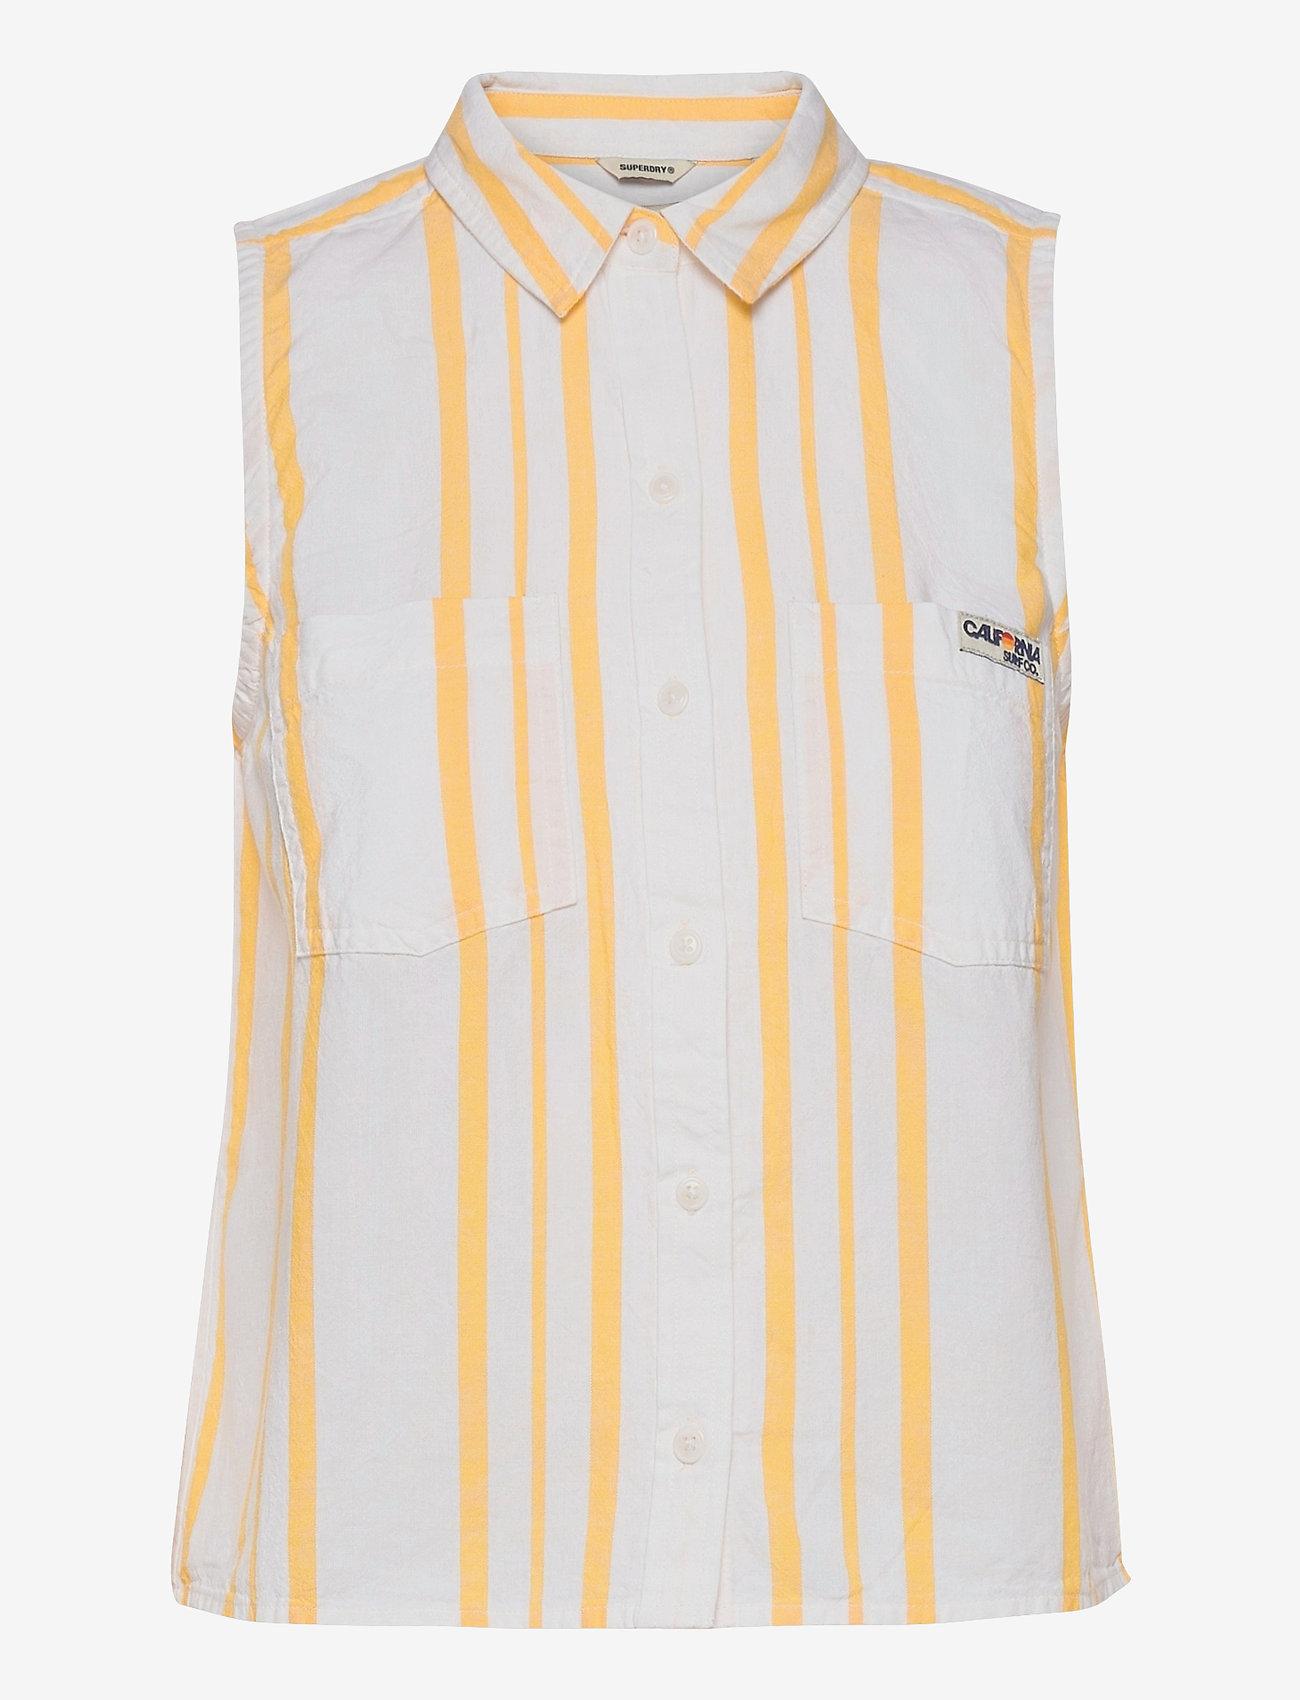 Superdry - SLEEVELESS SHIRT - Ärmellose blusen - yellow stripe - 0